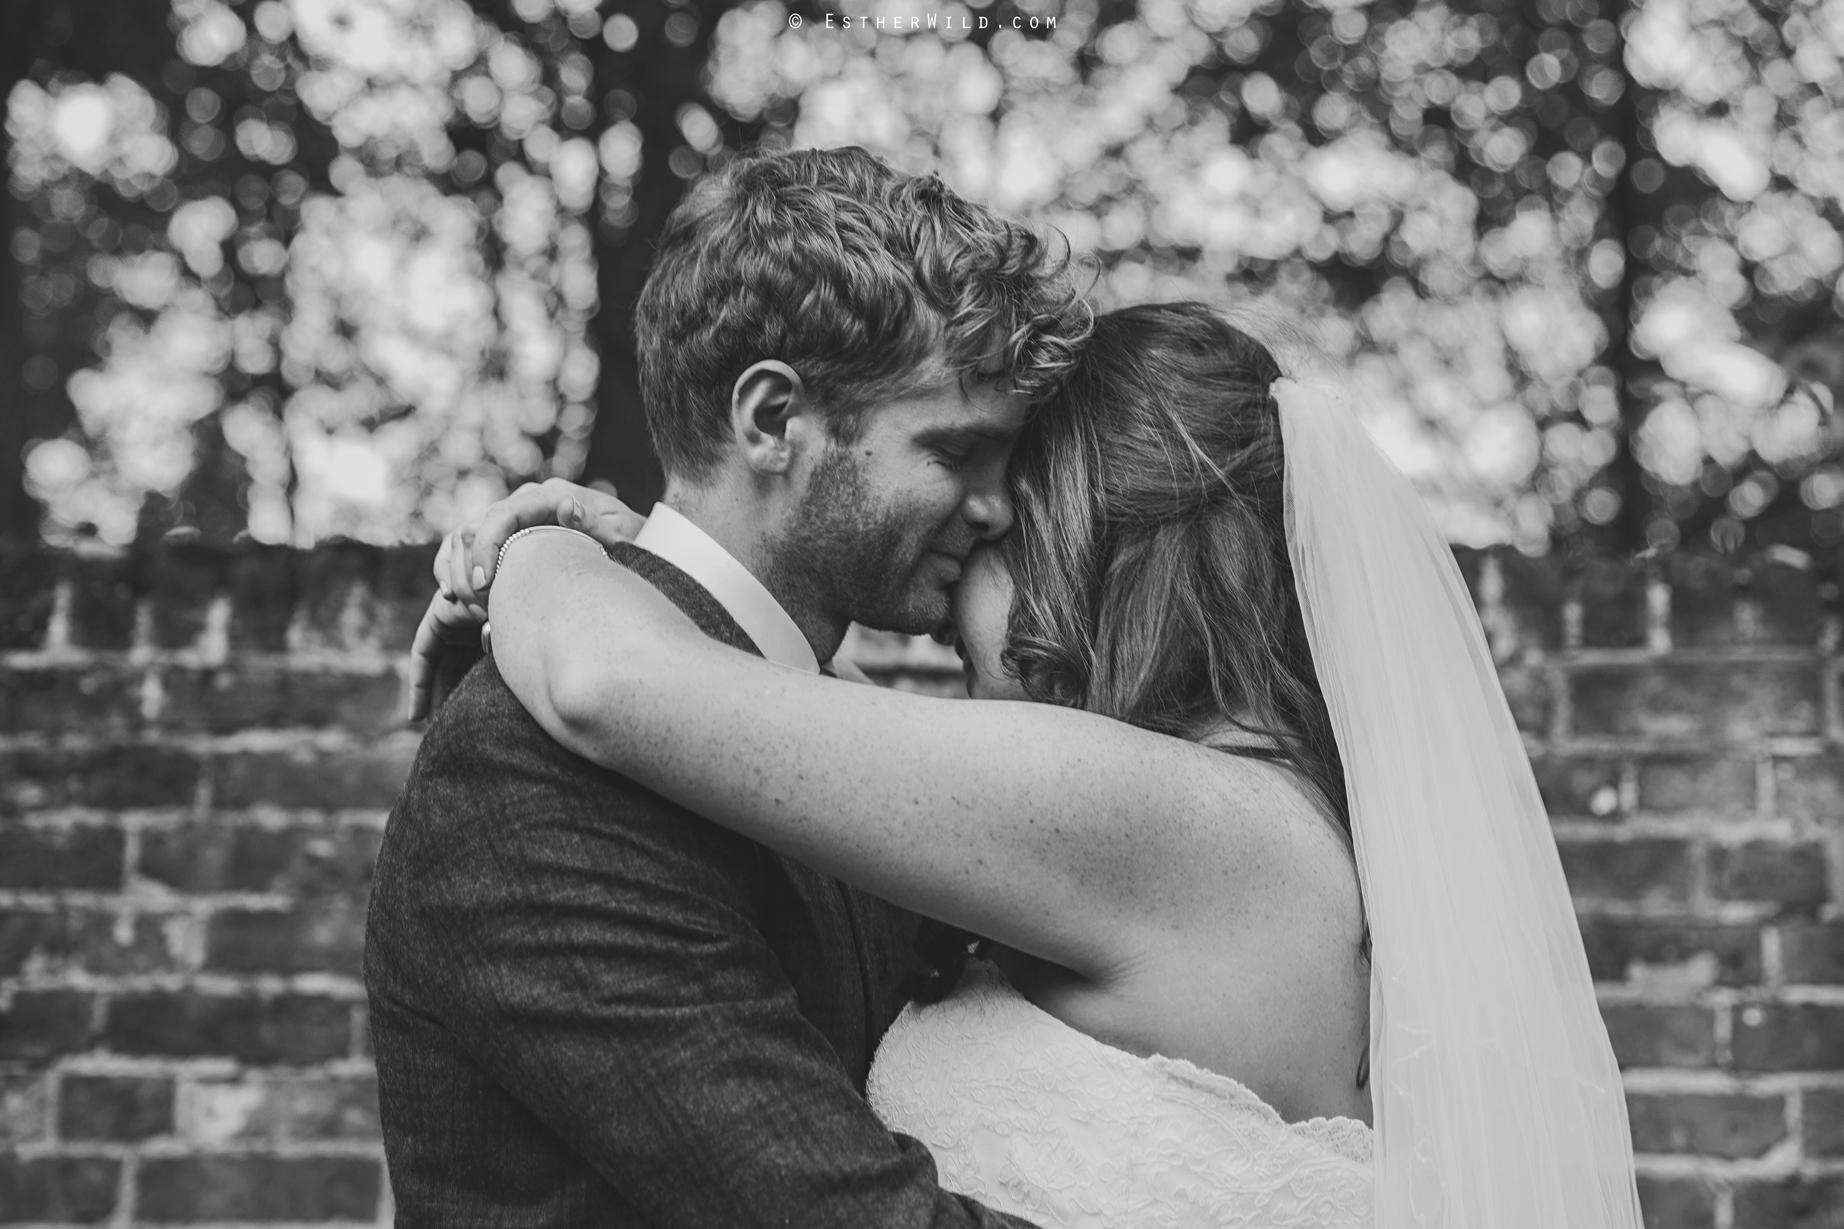 Reading_Room_Weddings_Alby_Norwich_Photographer_Esther_Wild_IMG_1817-1.jpg